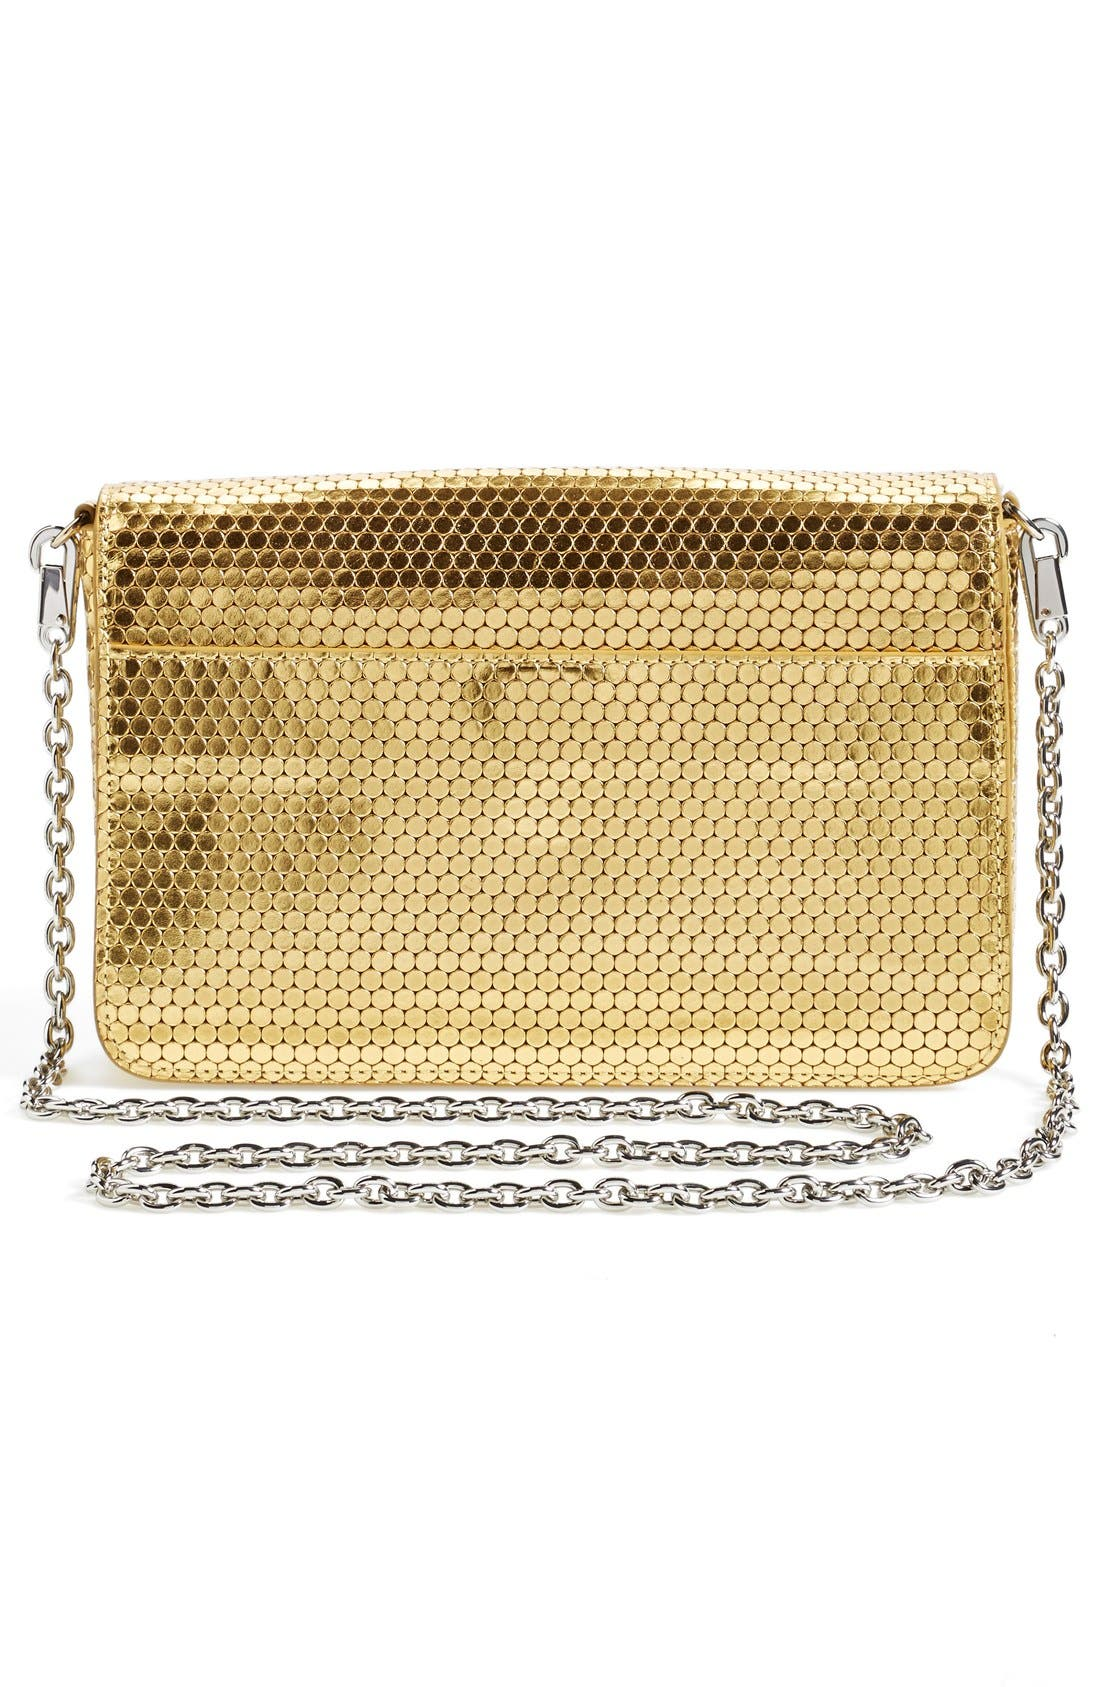 Alternate Image 3  - KENZO 'Raindrop' Metallic Leather Shoulder Bag